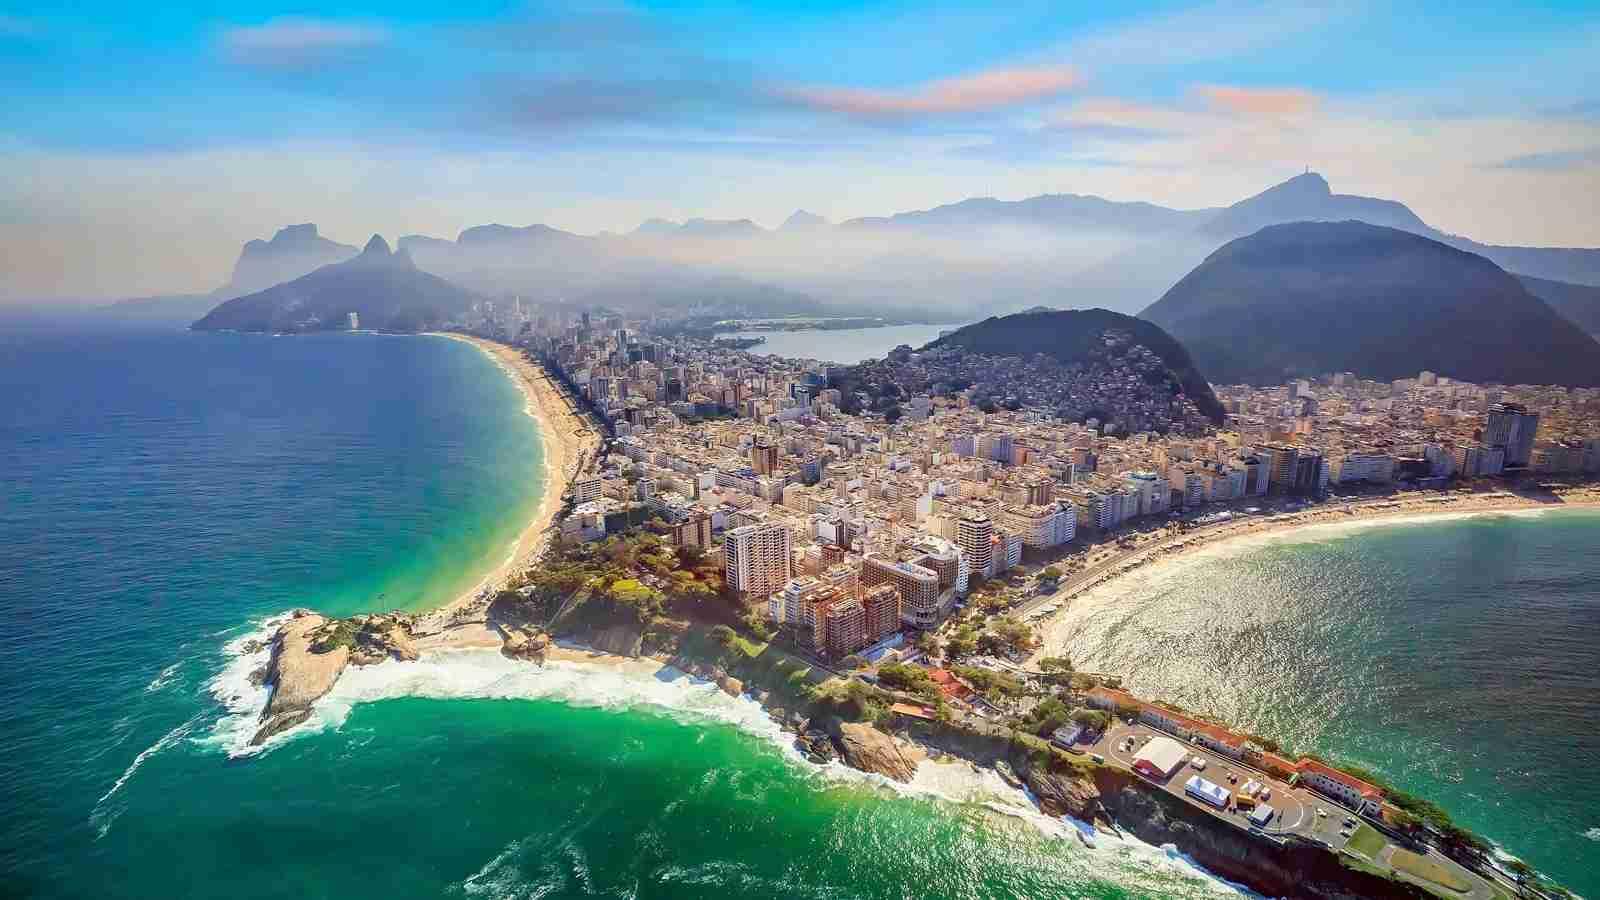 Copacabana Beach and Ipanema beach, Rio de Janiero. (Photo by f11photo / Getty Images)